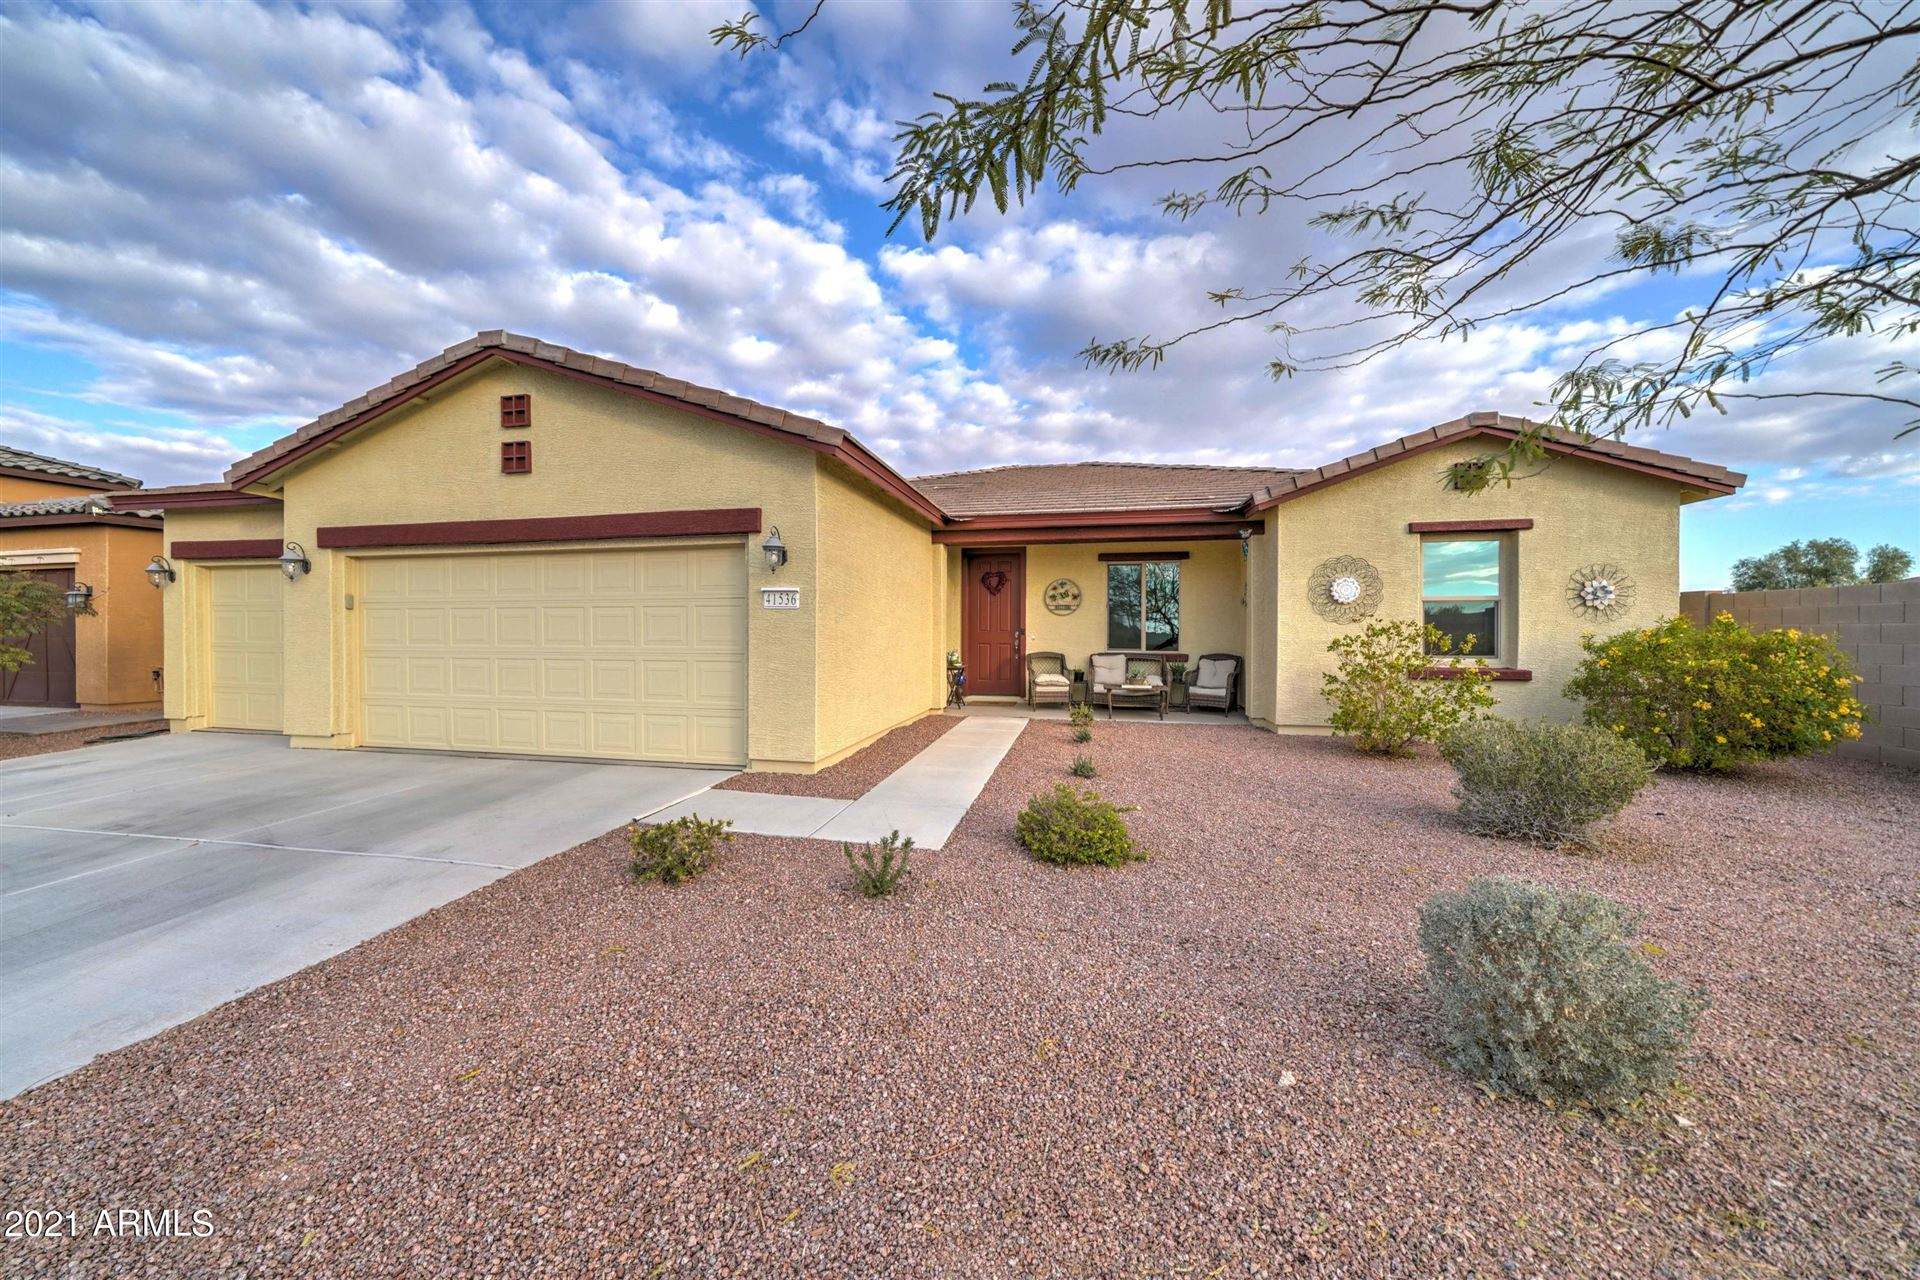 41536 W SOLSTICE Court, Maricopa, AZ 85138 - MLS#: 6160453